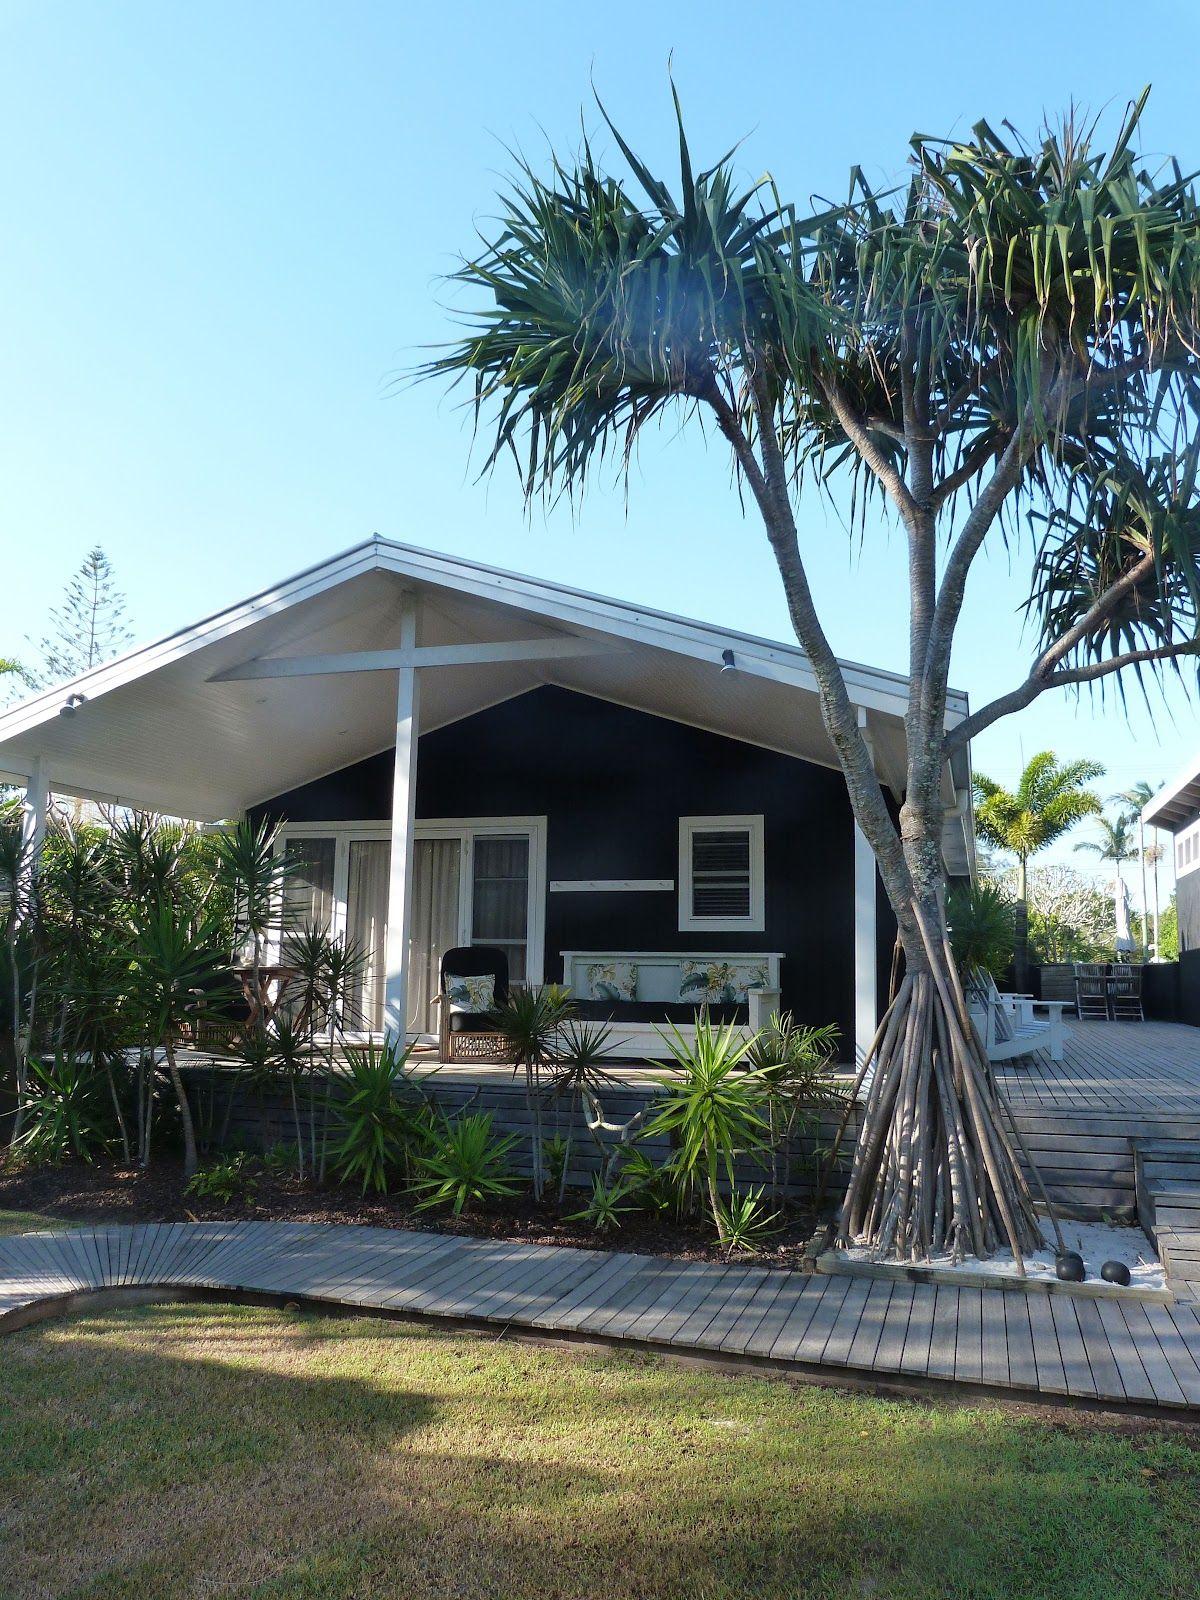 Dream Beach Cottage With Neutral Coastal Decor: Beachcomber Atlantic Guesthouses Byron Bay